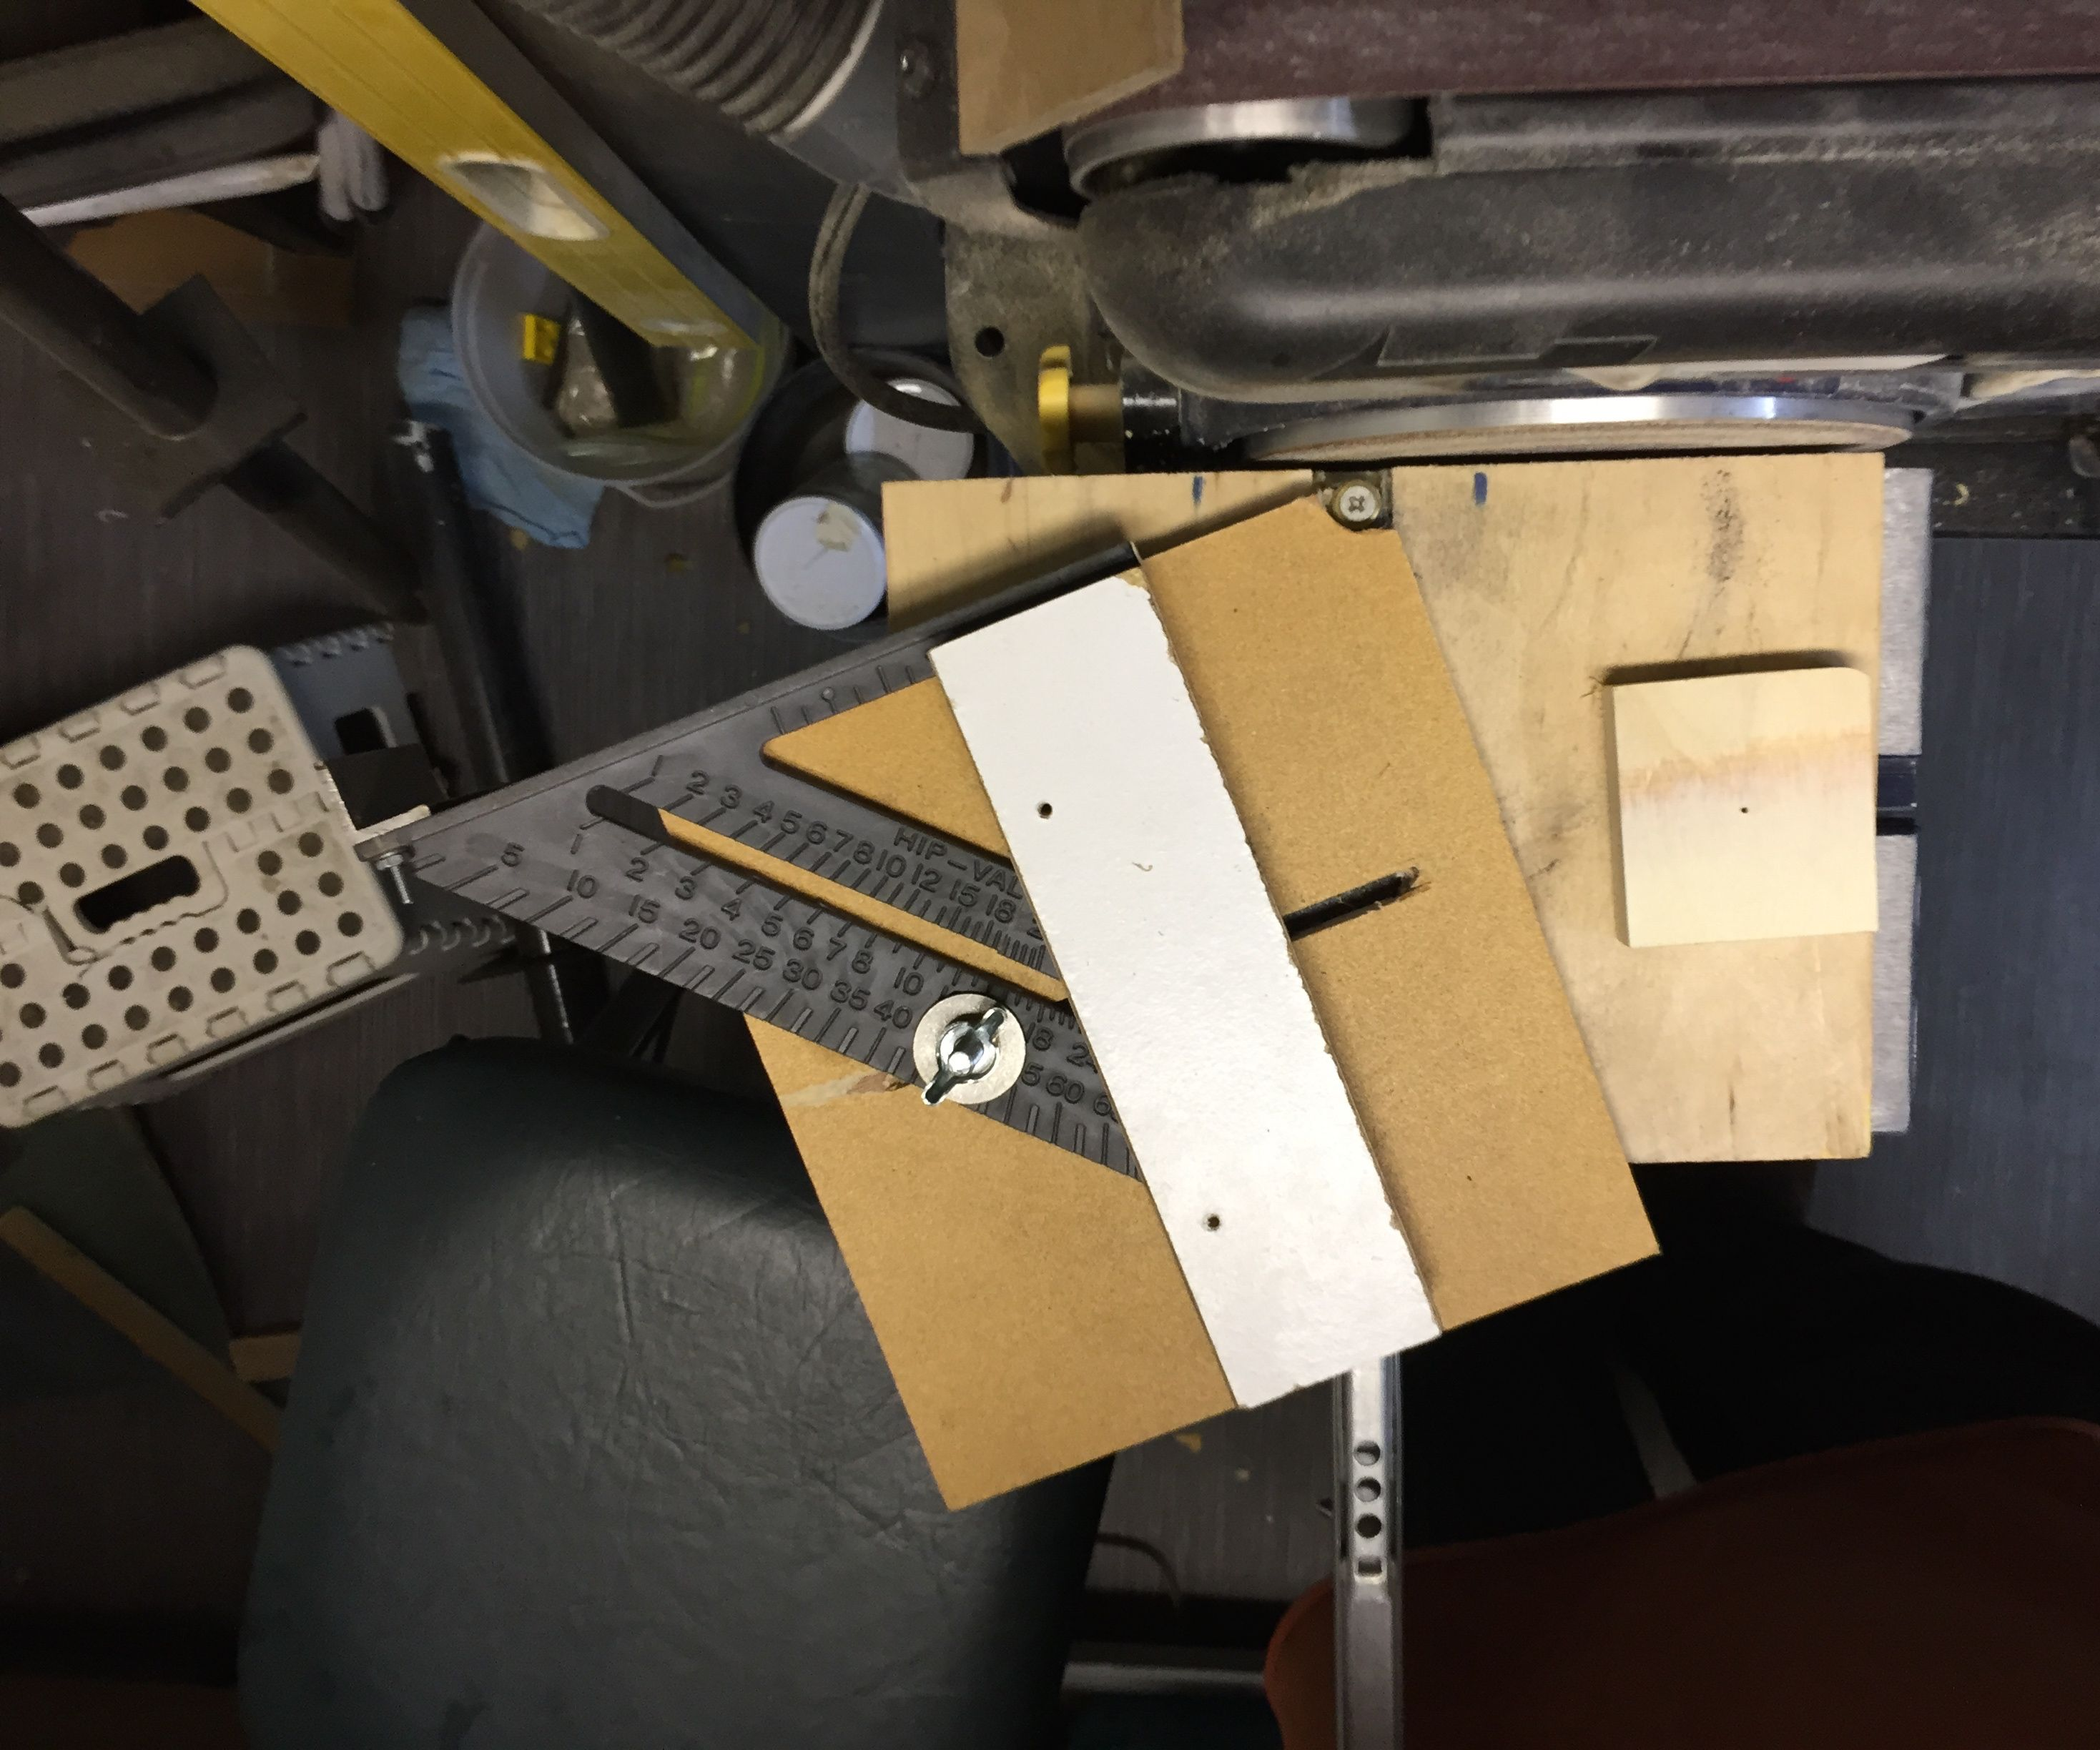 Corner rounding jig for a disk sander